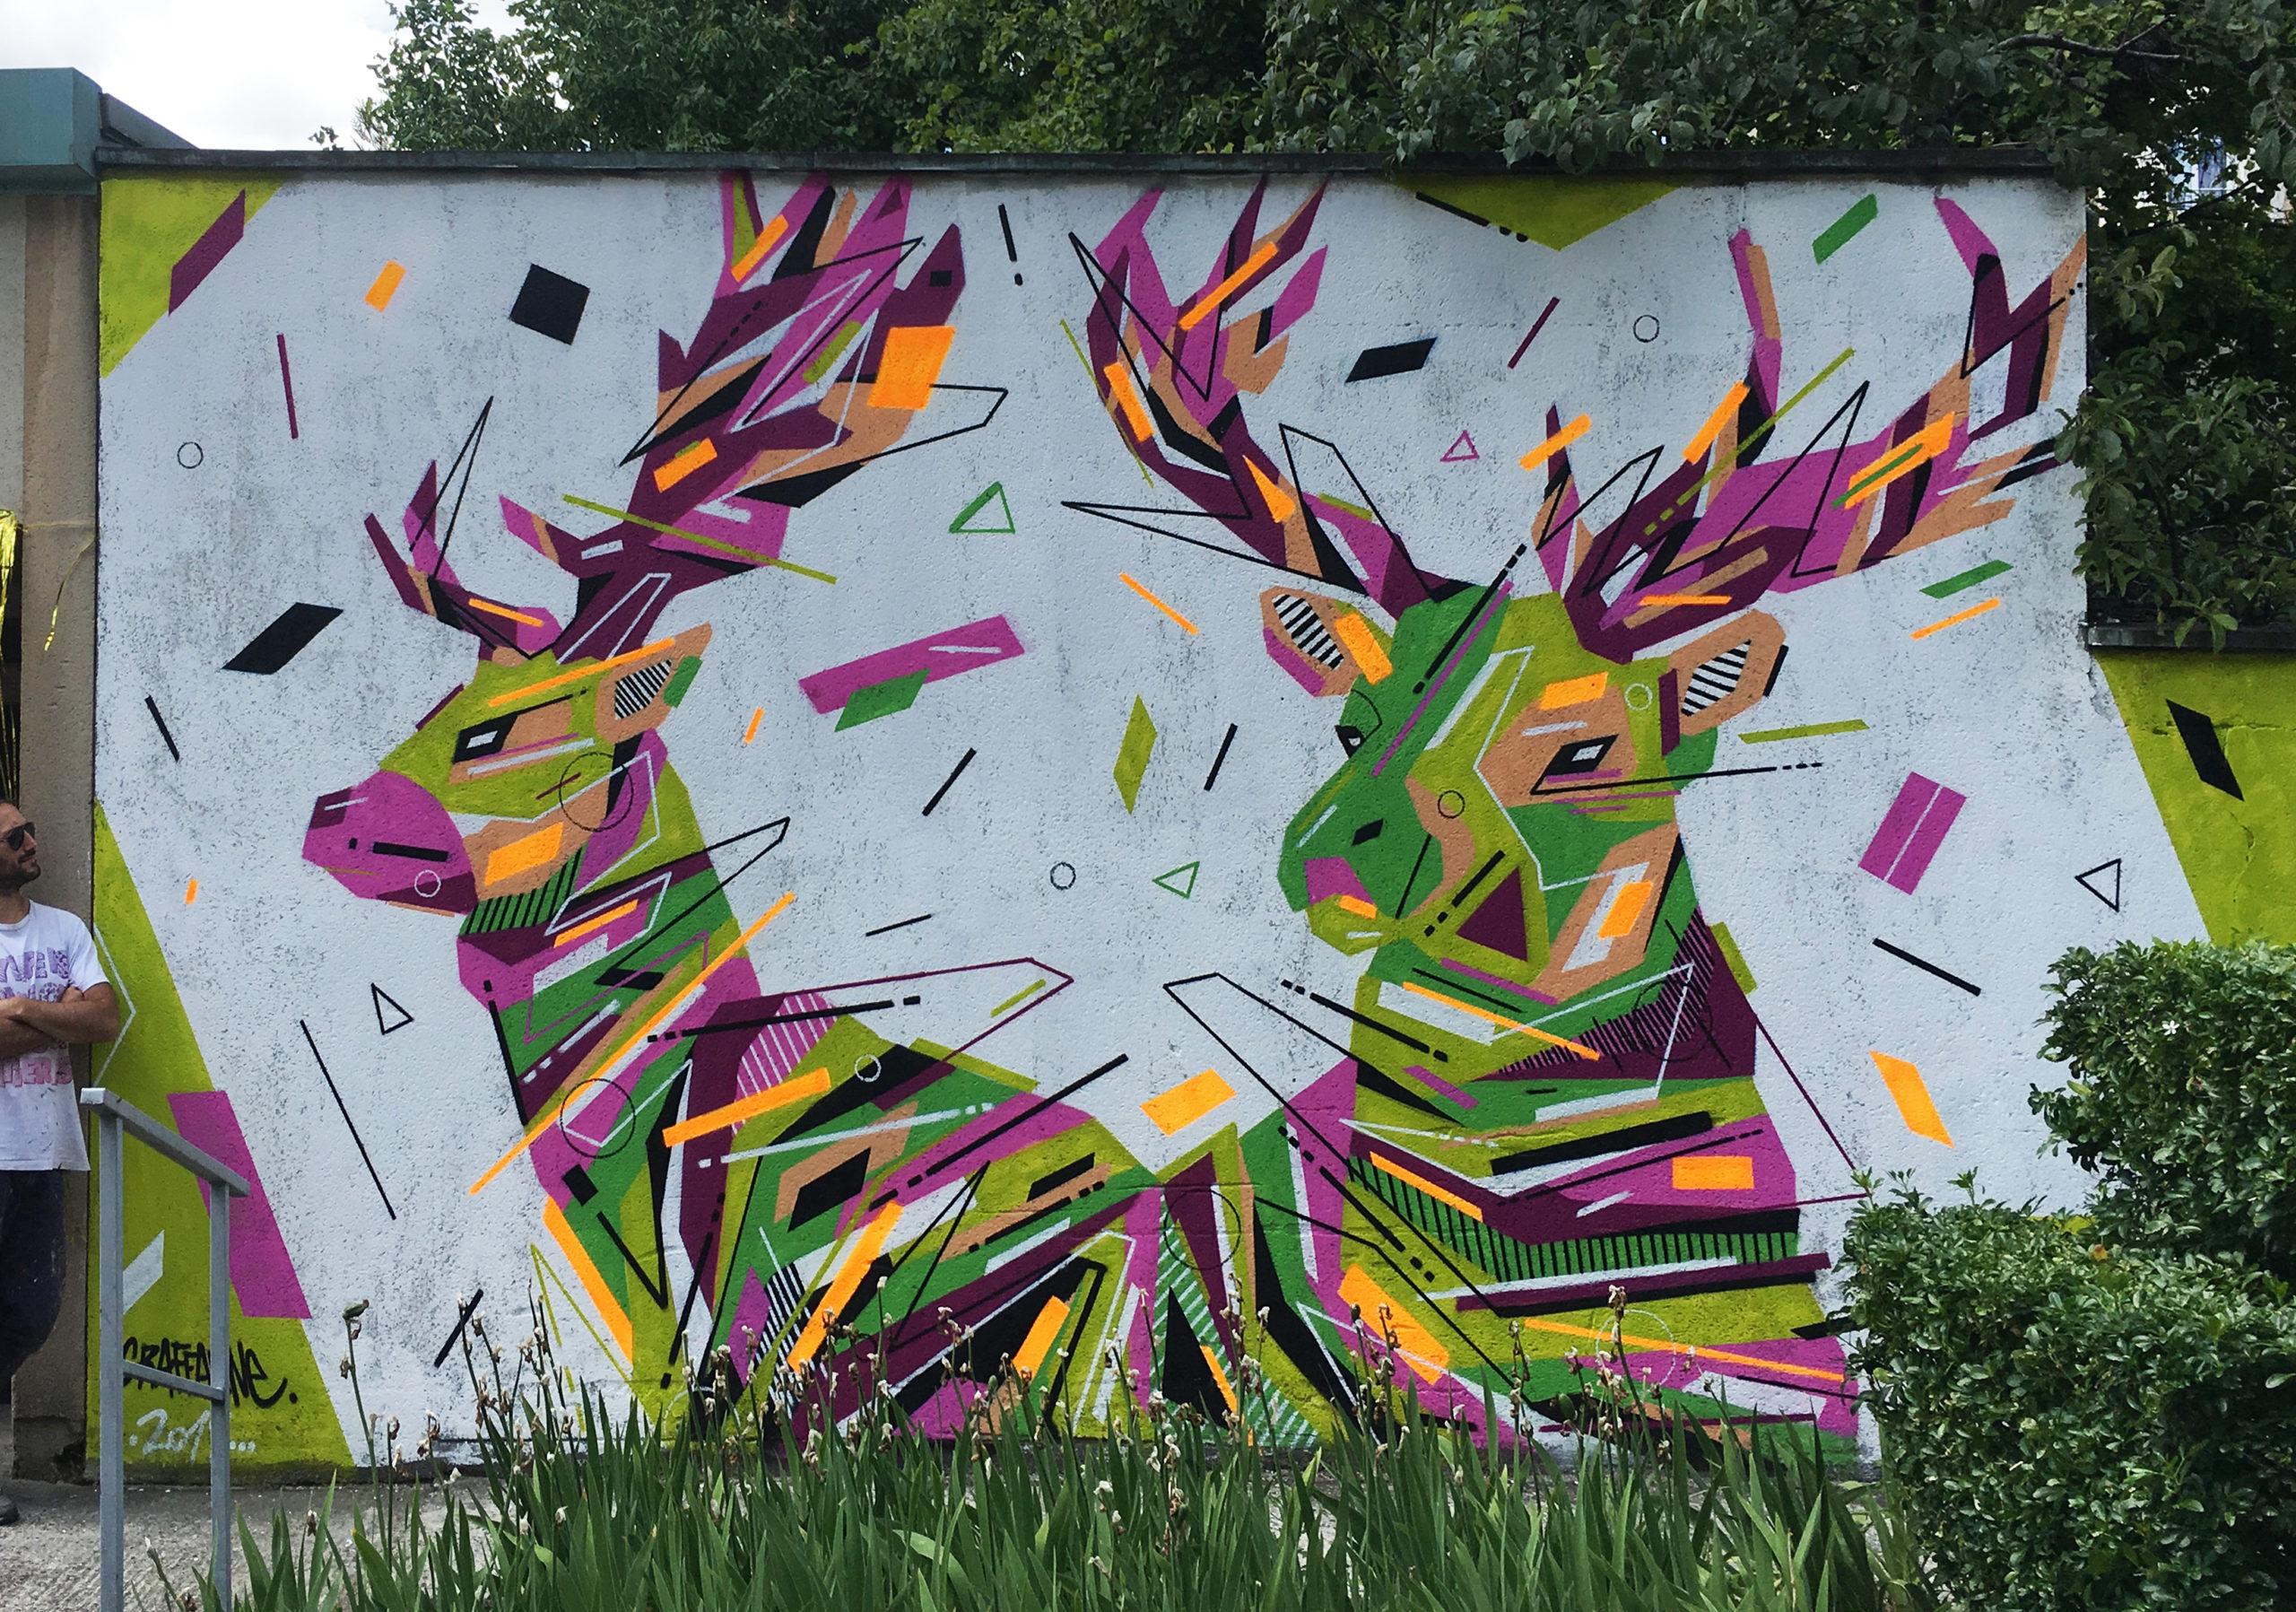 Fresque Graffaune Graffiti cerfs réalisée par Daco